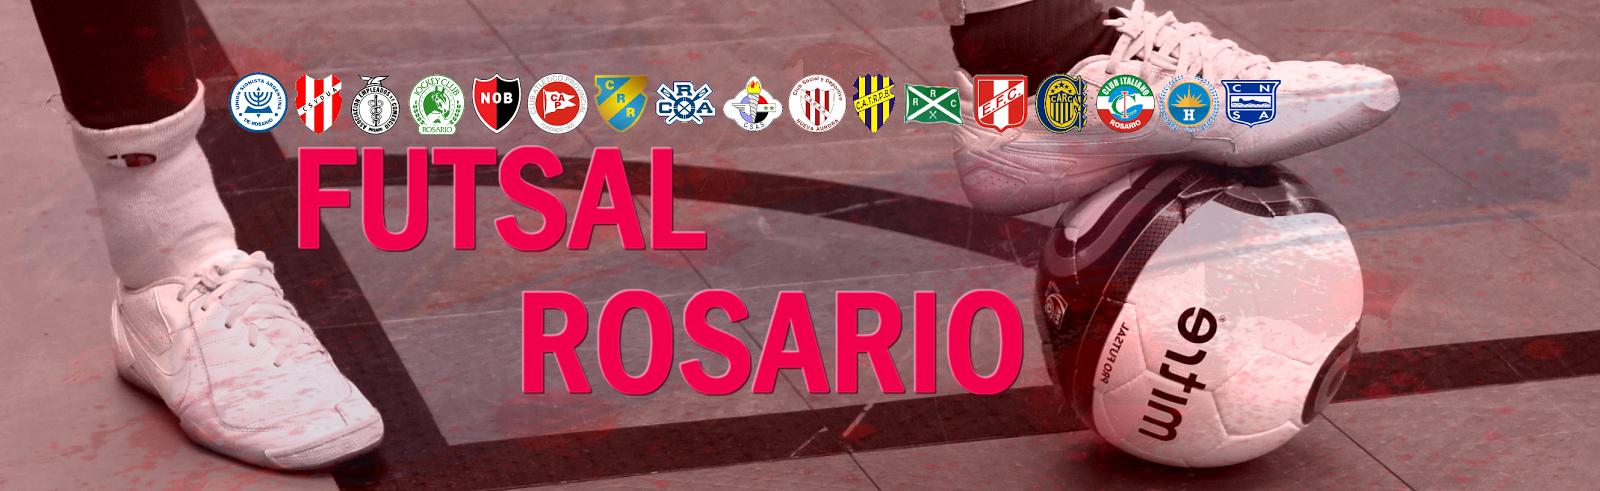 Futsal Rosario